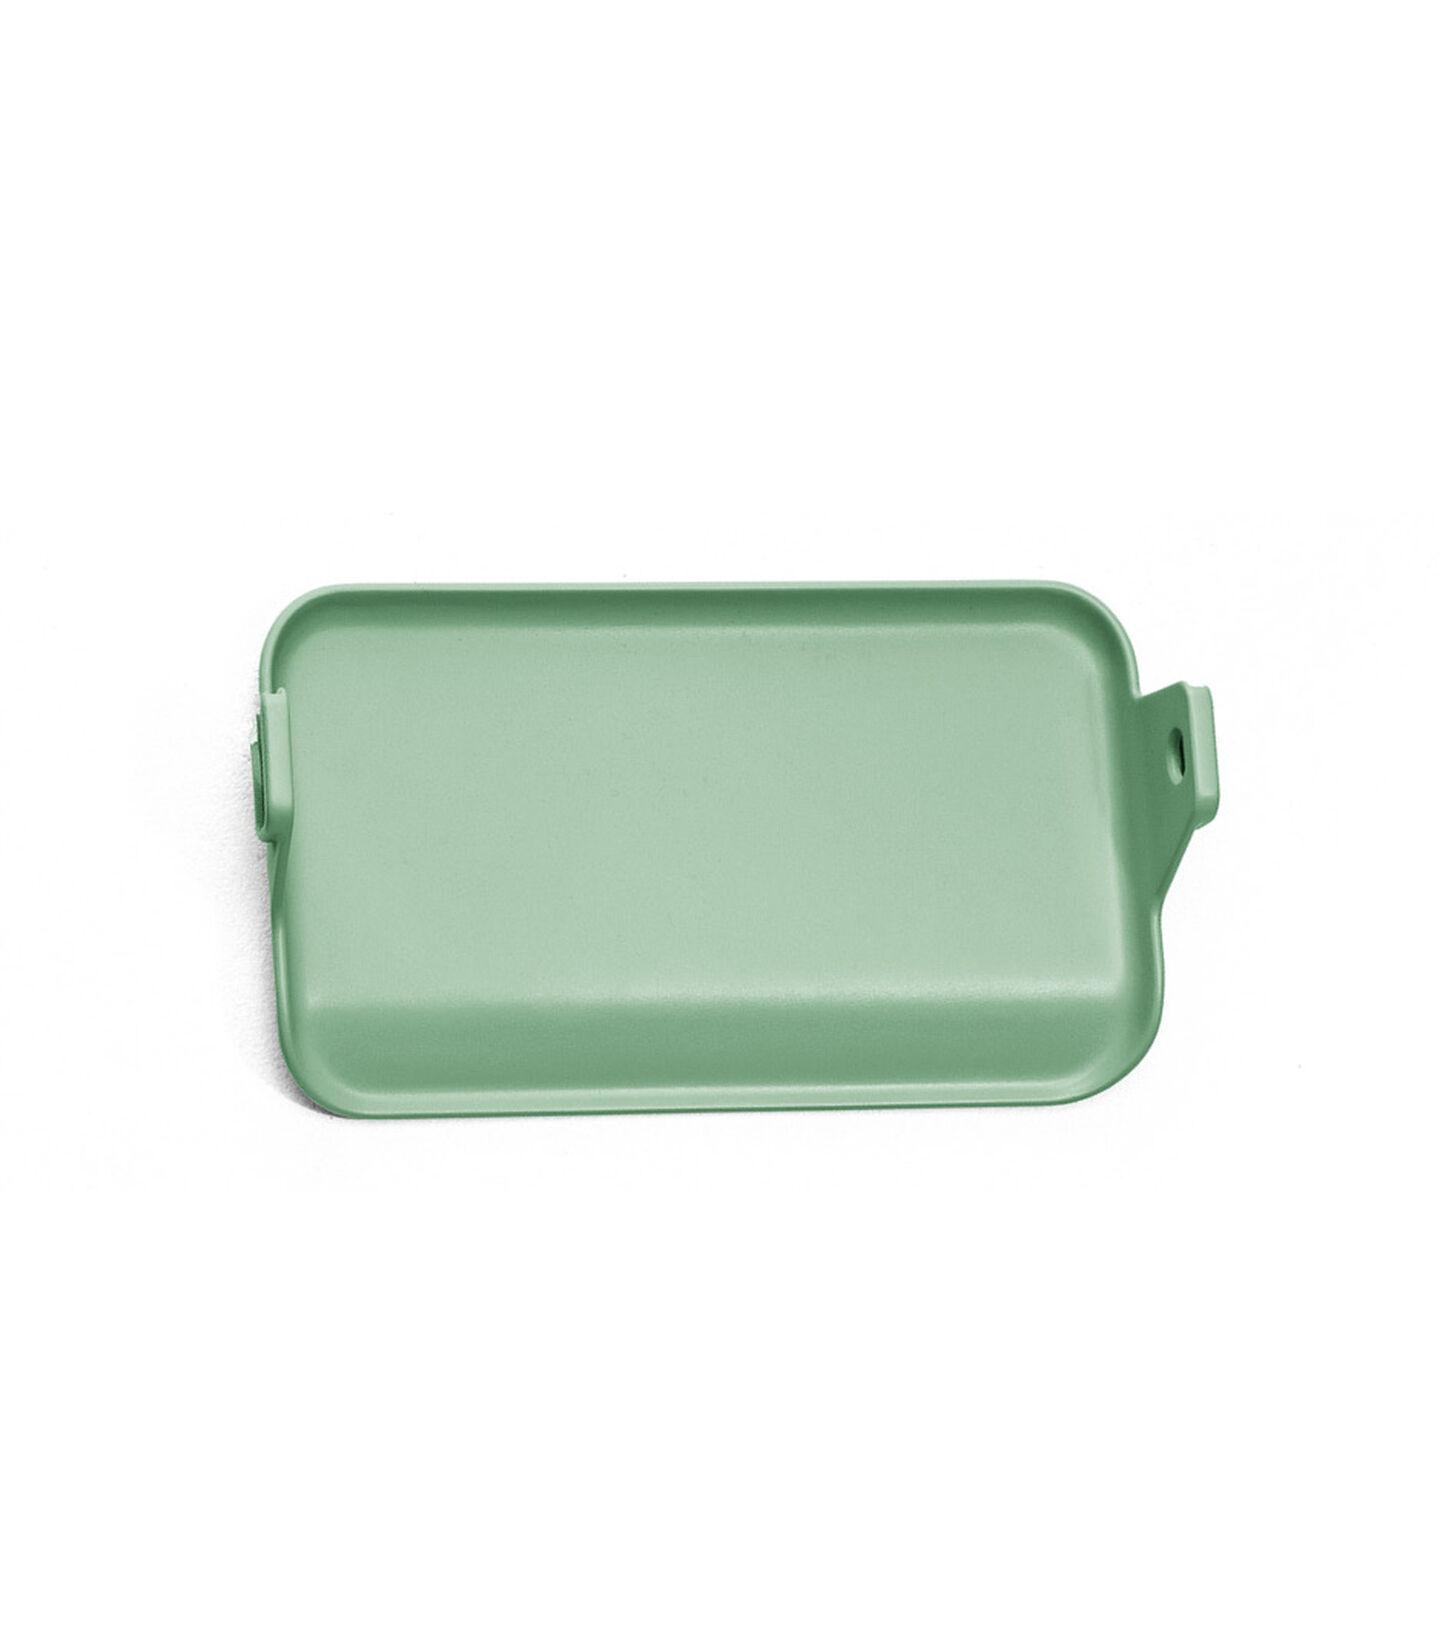 Stokke® Clikk™ Footrest Clover Green, Clover Green, mainview view 1